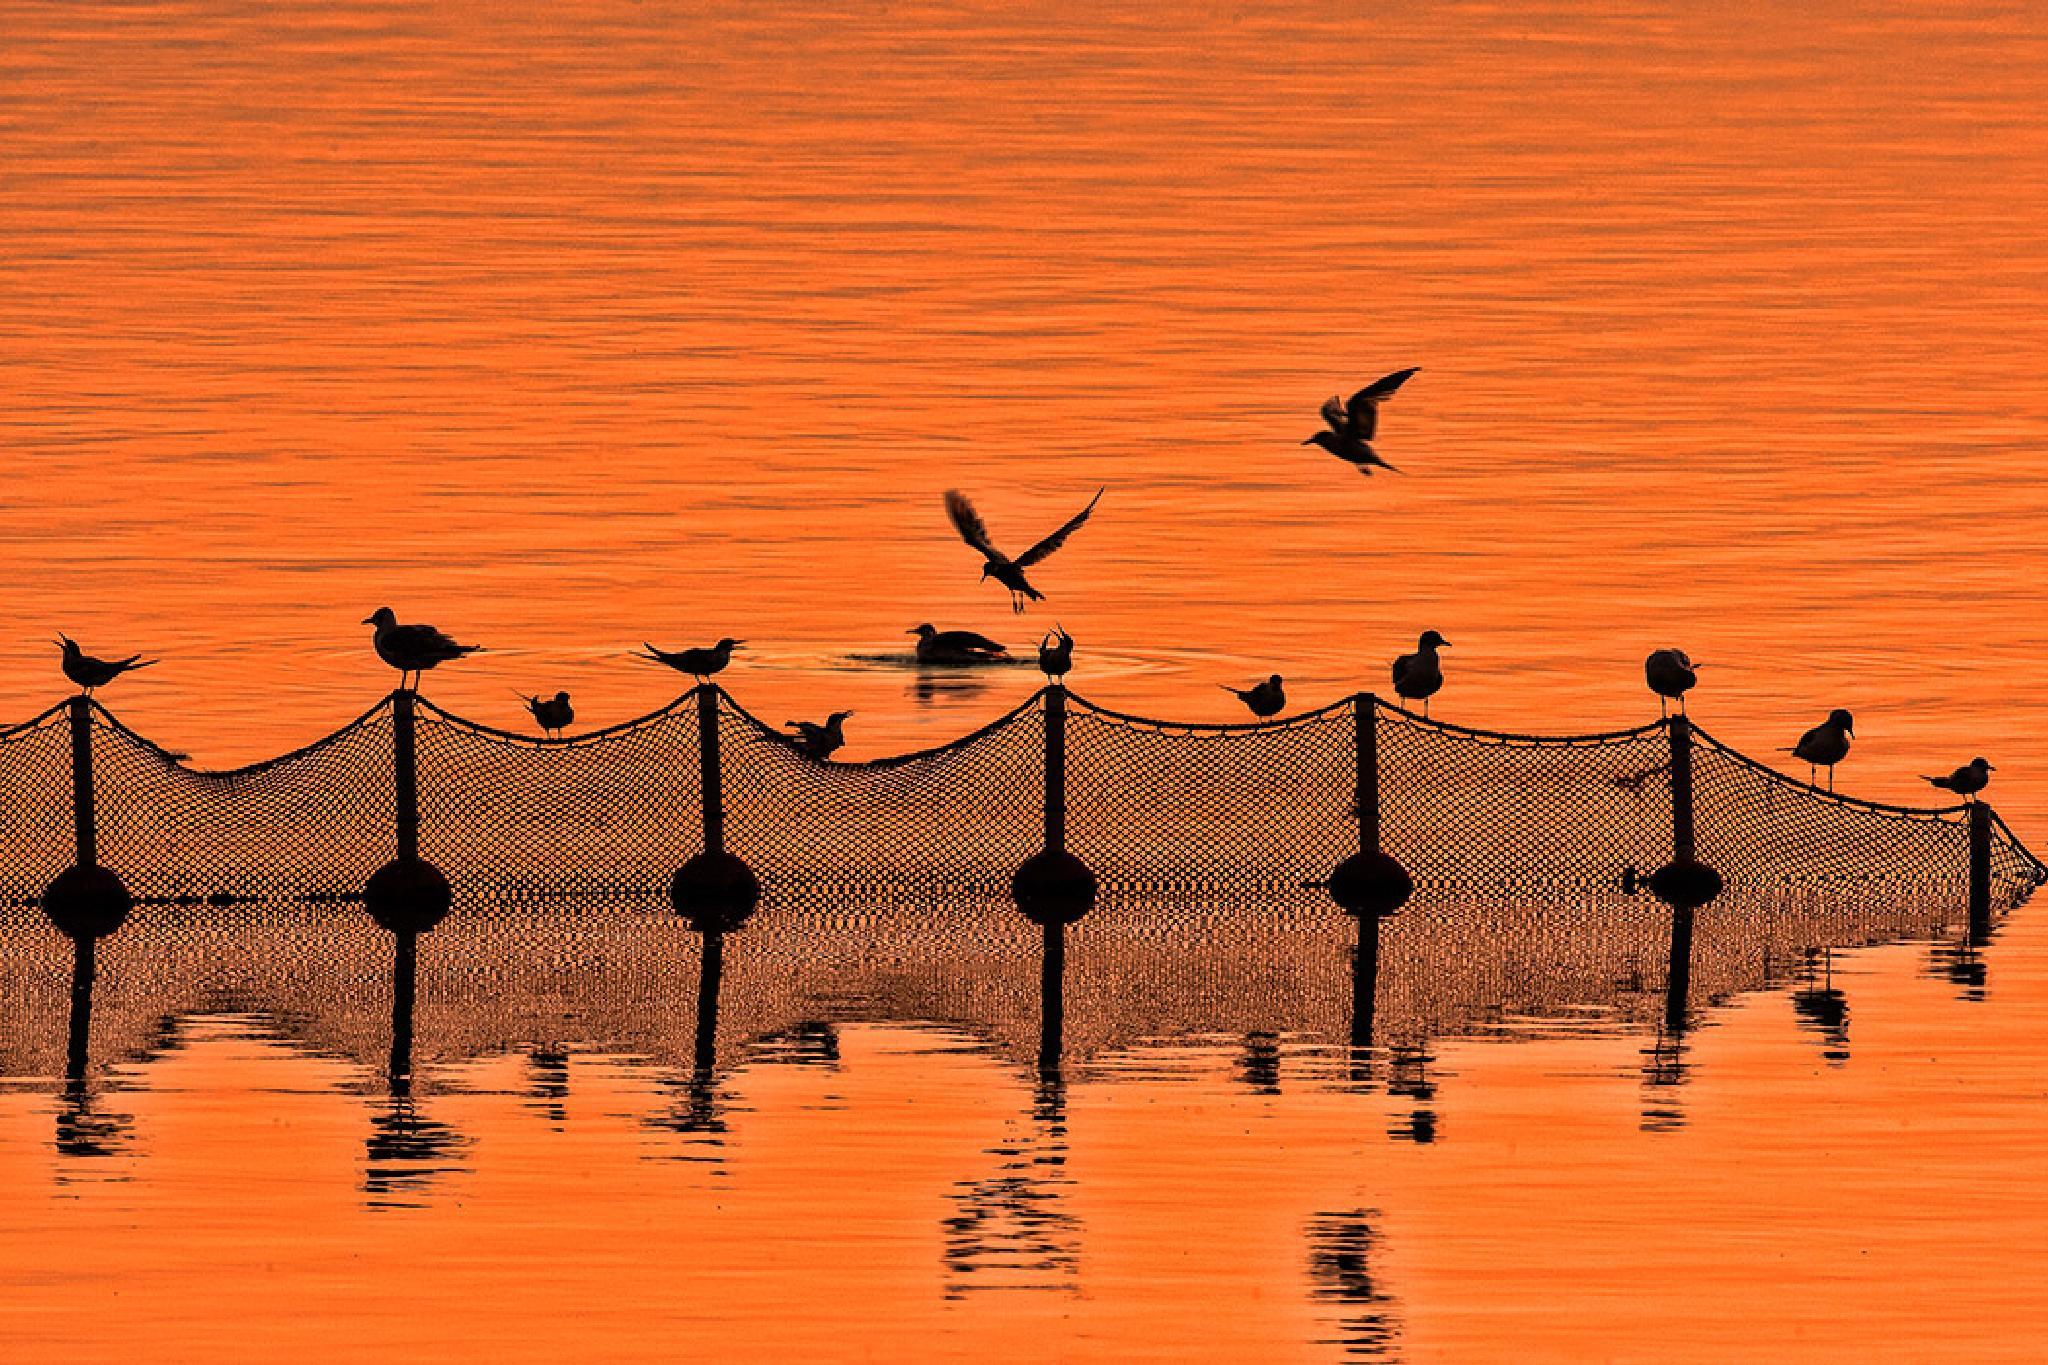 Sunrise, the birds by Sotiris Siomis